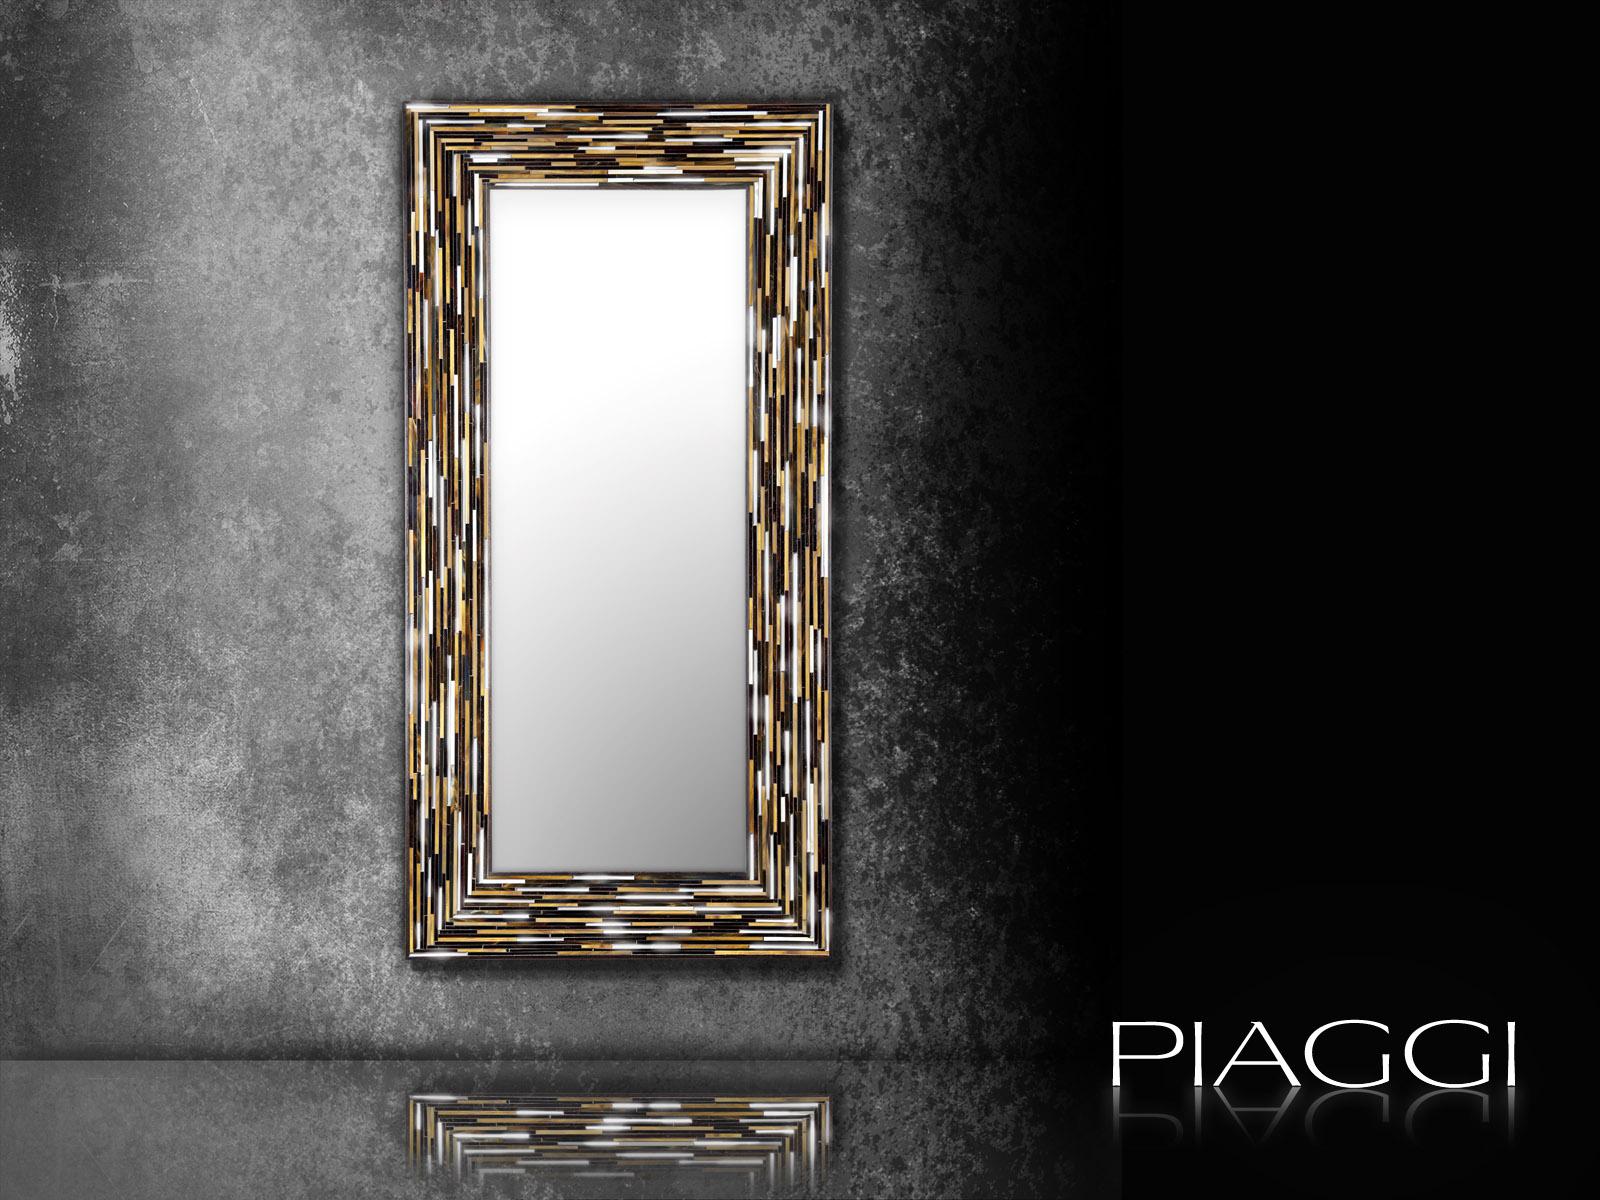 Piaggi miroirs big q for Miroir 80x160